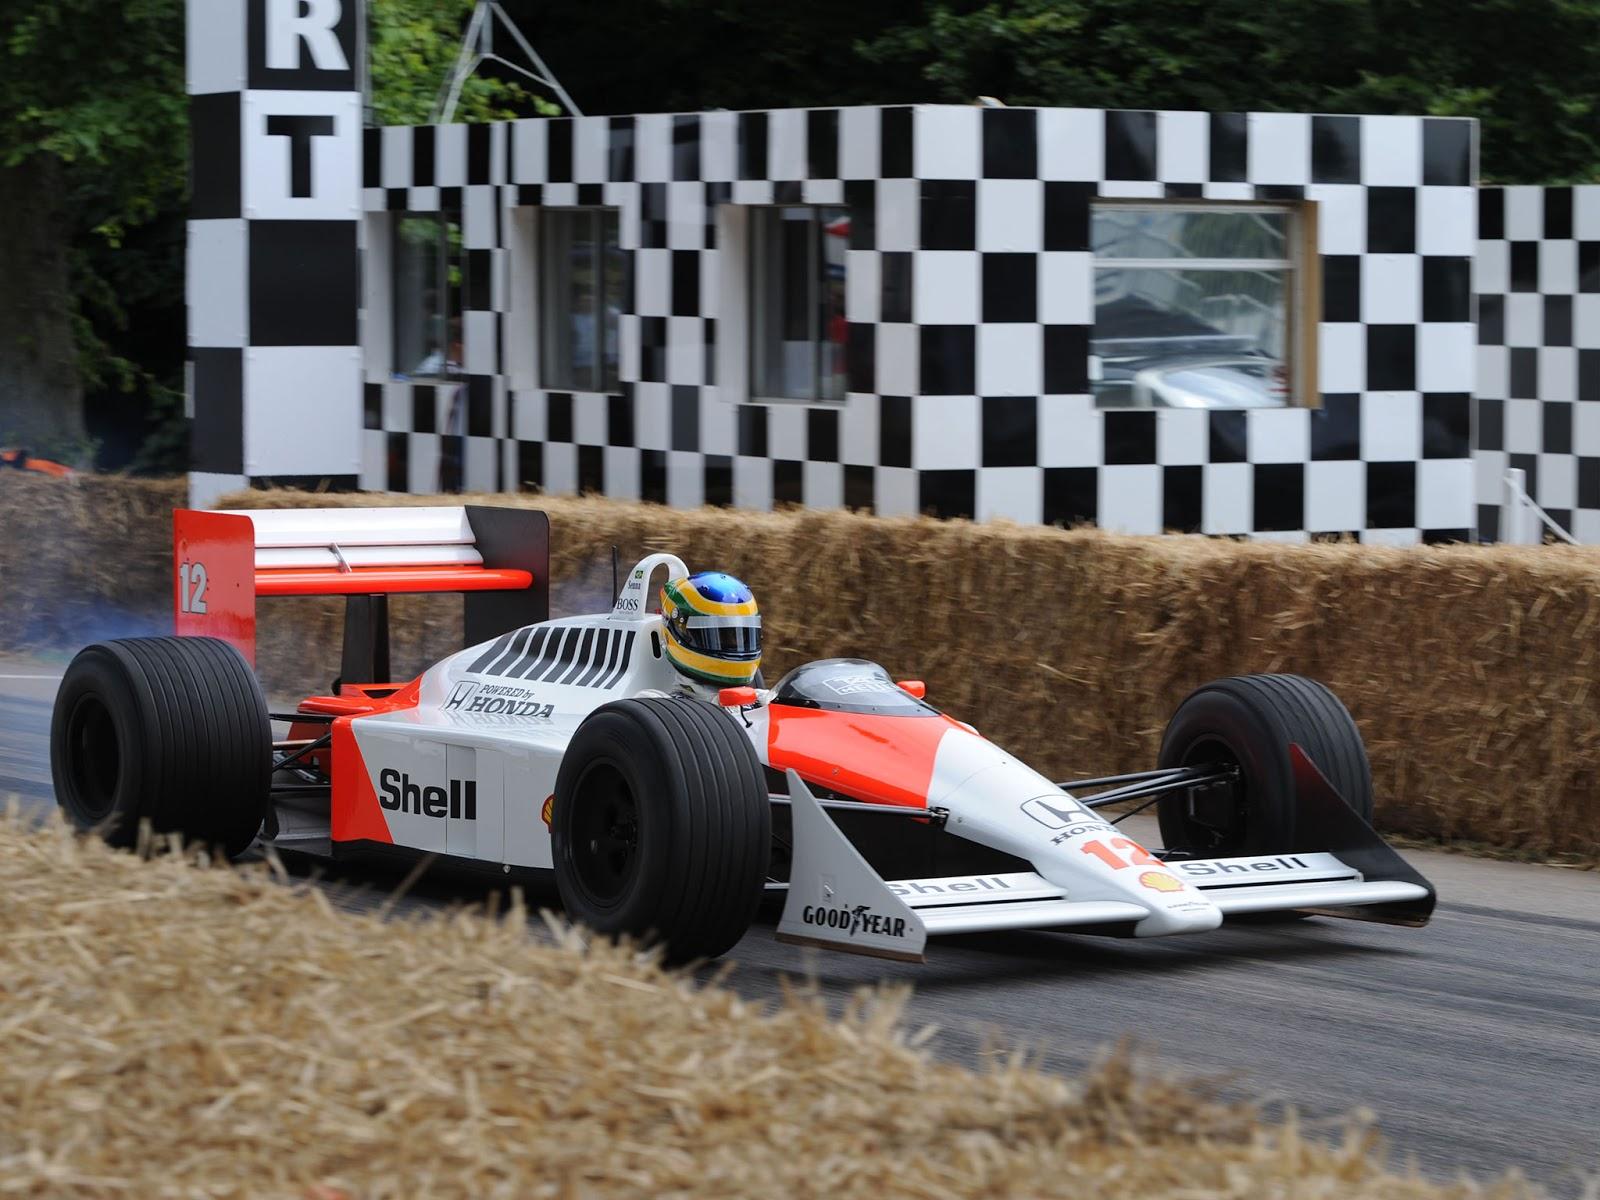 McLarenFOS Παρακολουθήστε ζωντανά το φεστιβάλ ταχύτητας στο GOODWOOD Charles March, GOODWOOD, Goodwood Festival of Speed, LIVE, video, videos